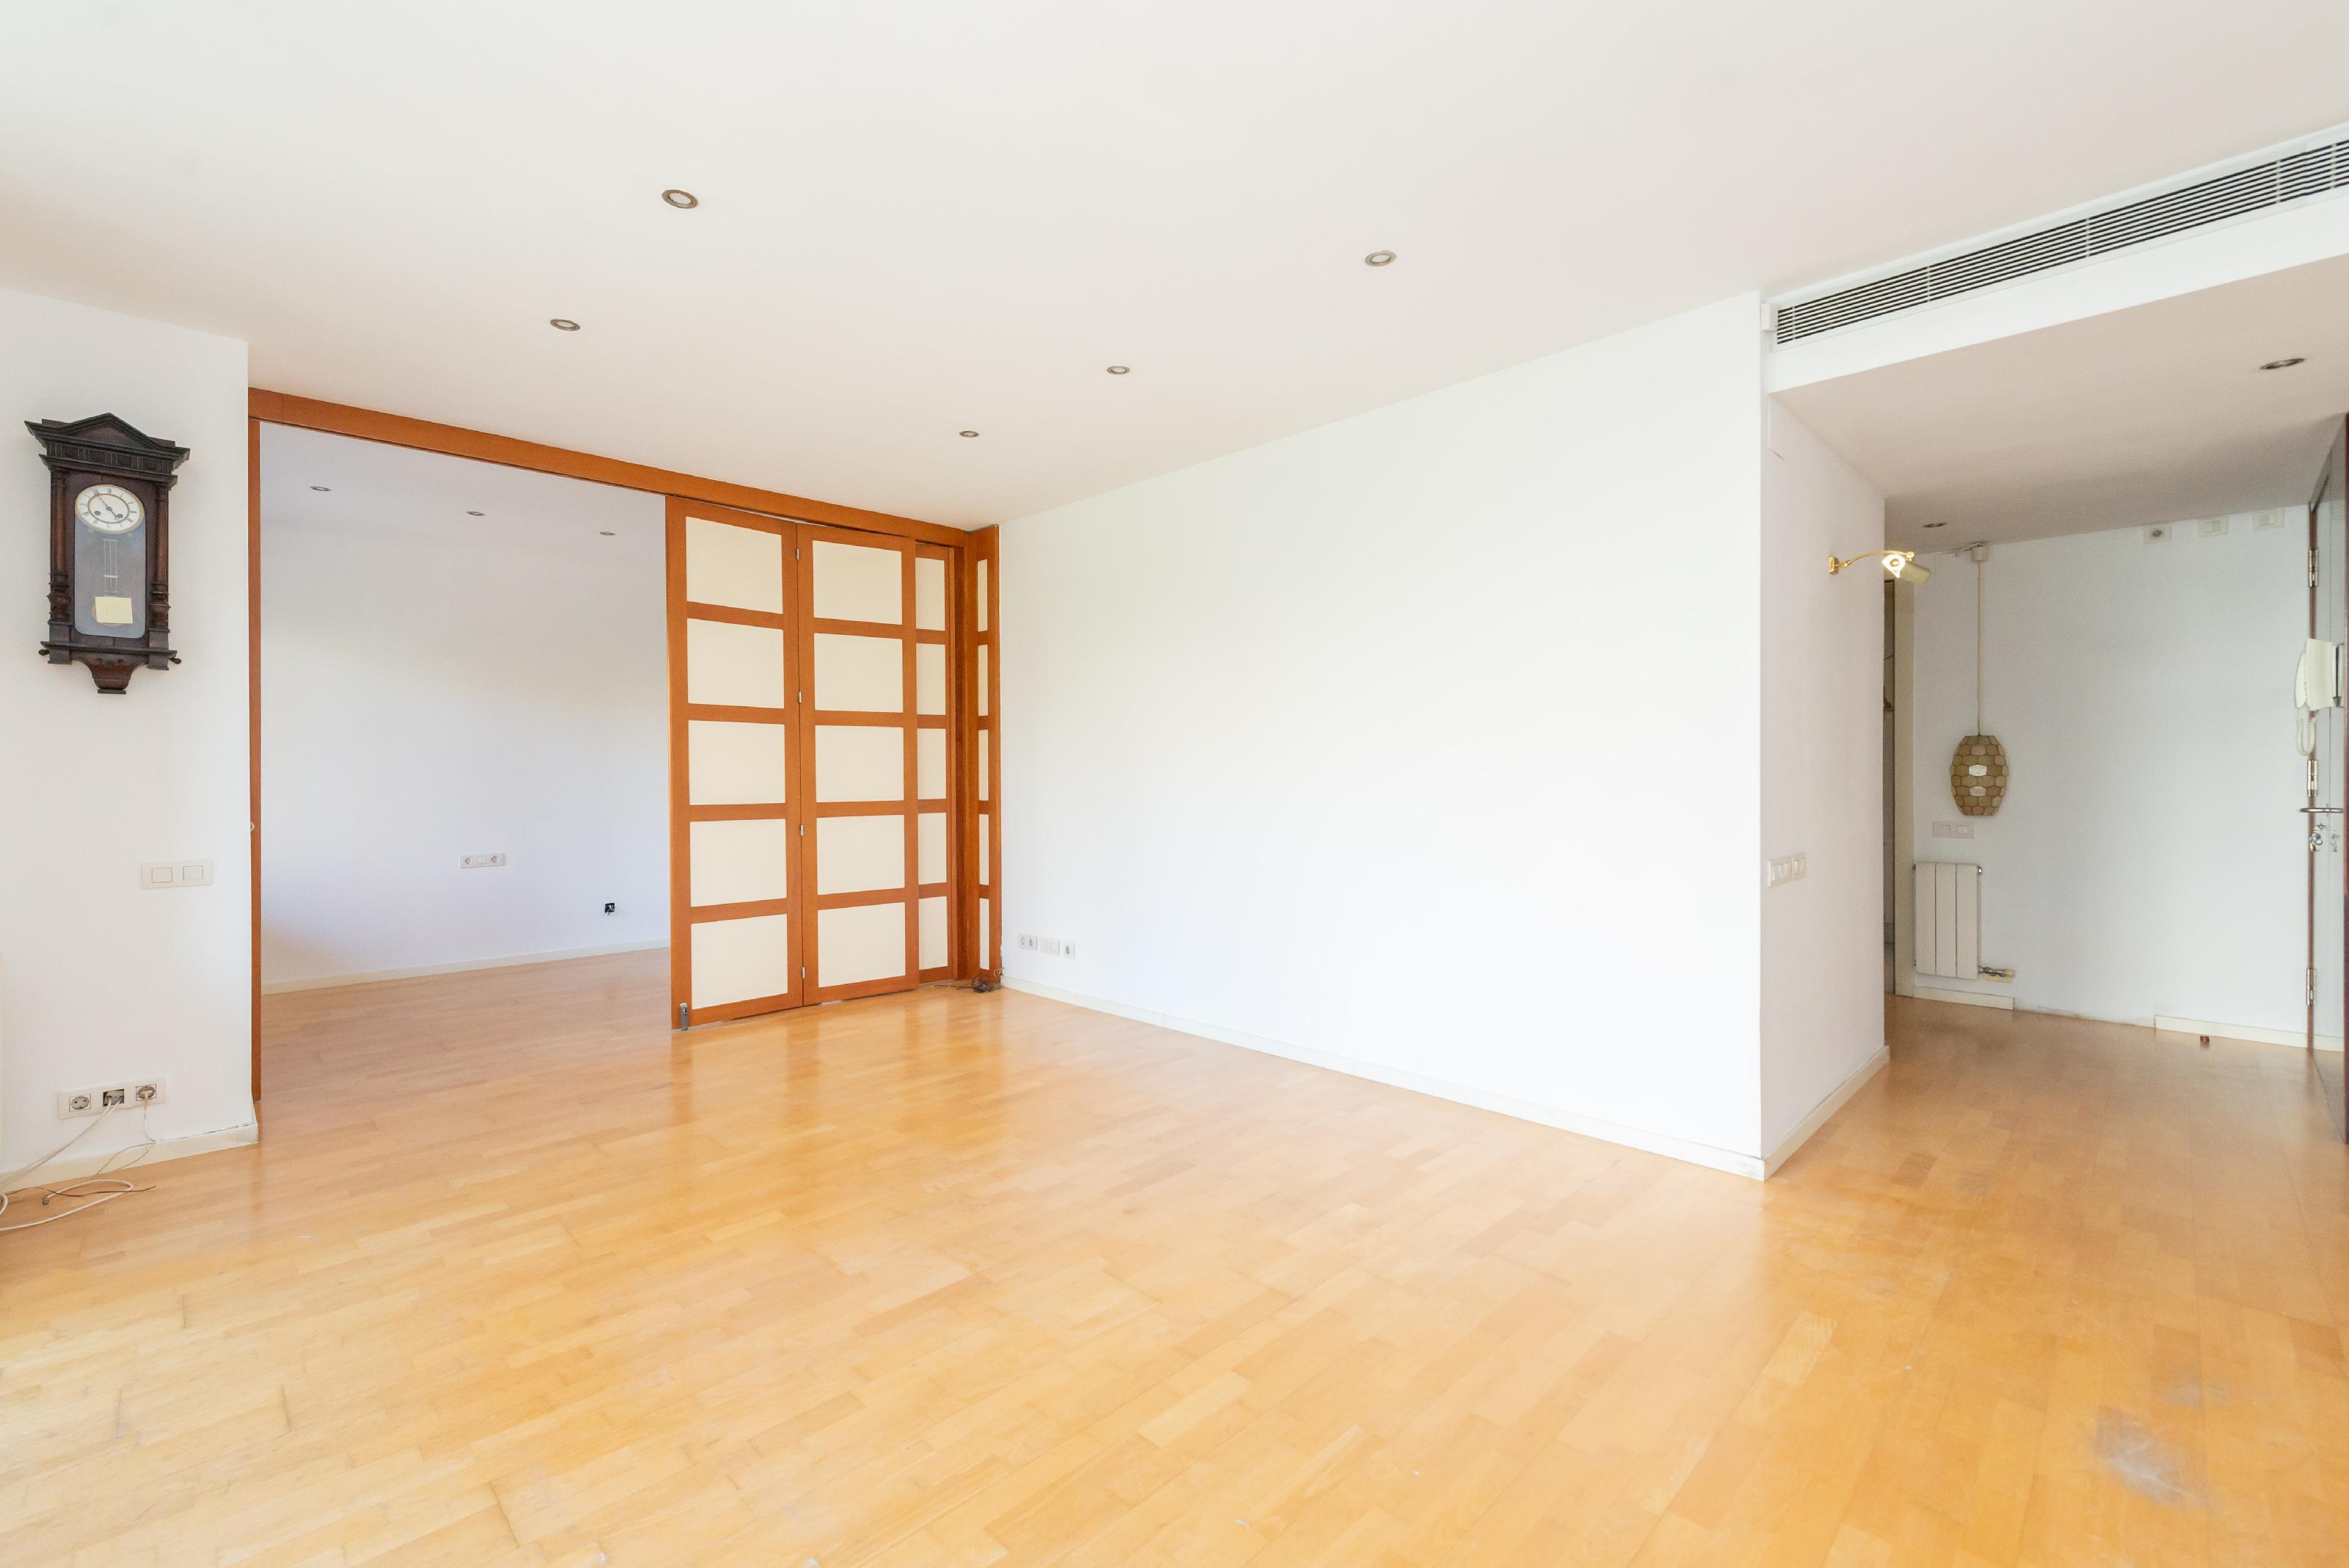 251446 Flat for sale in Sarrià-Sant Gervasi, Tres Torres 8